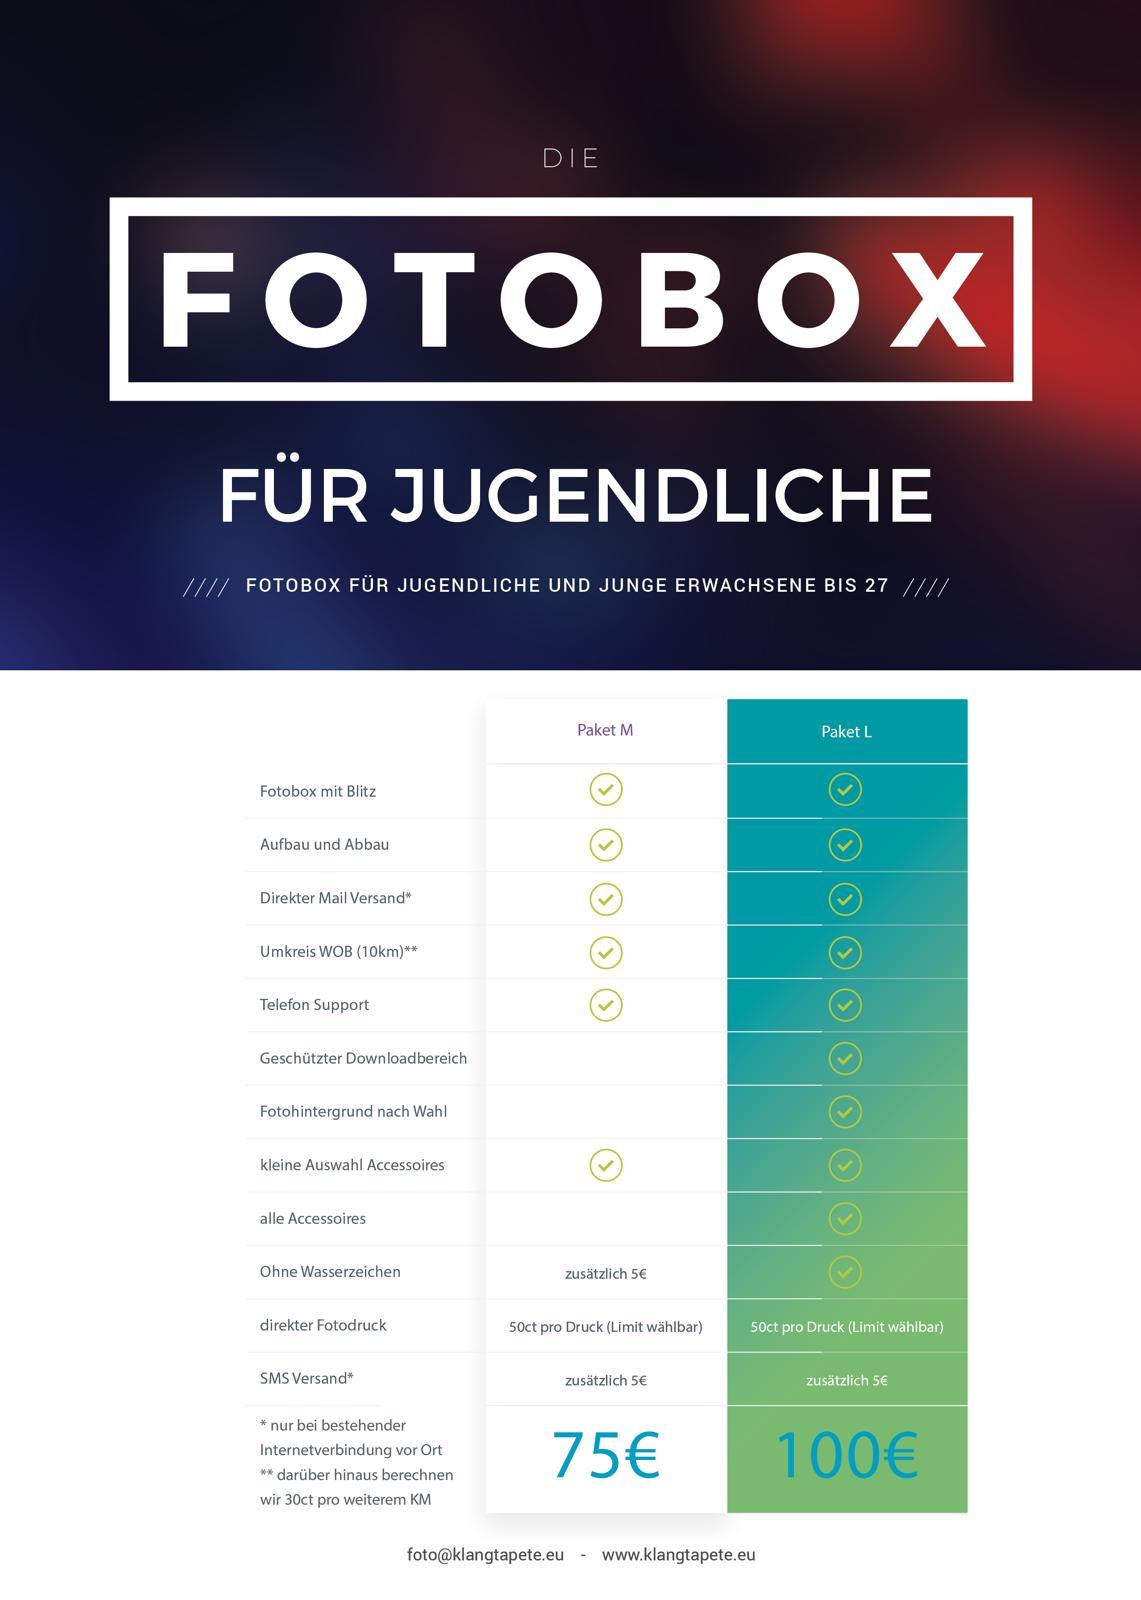 Fotobox-Pakete